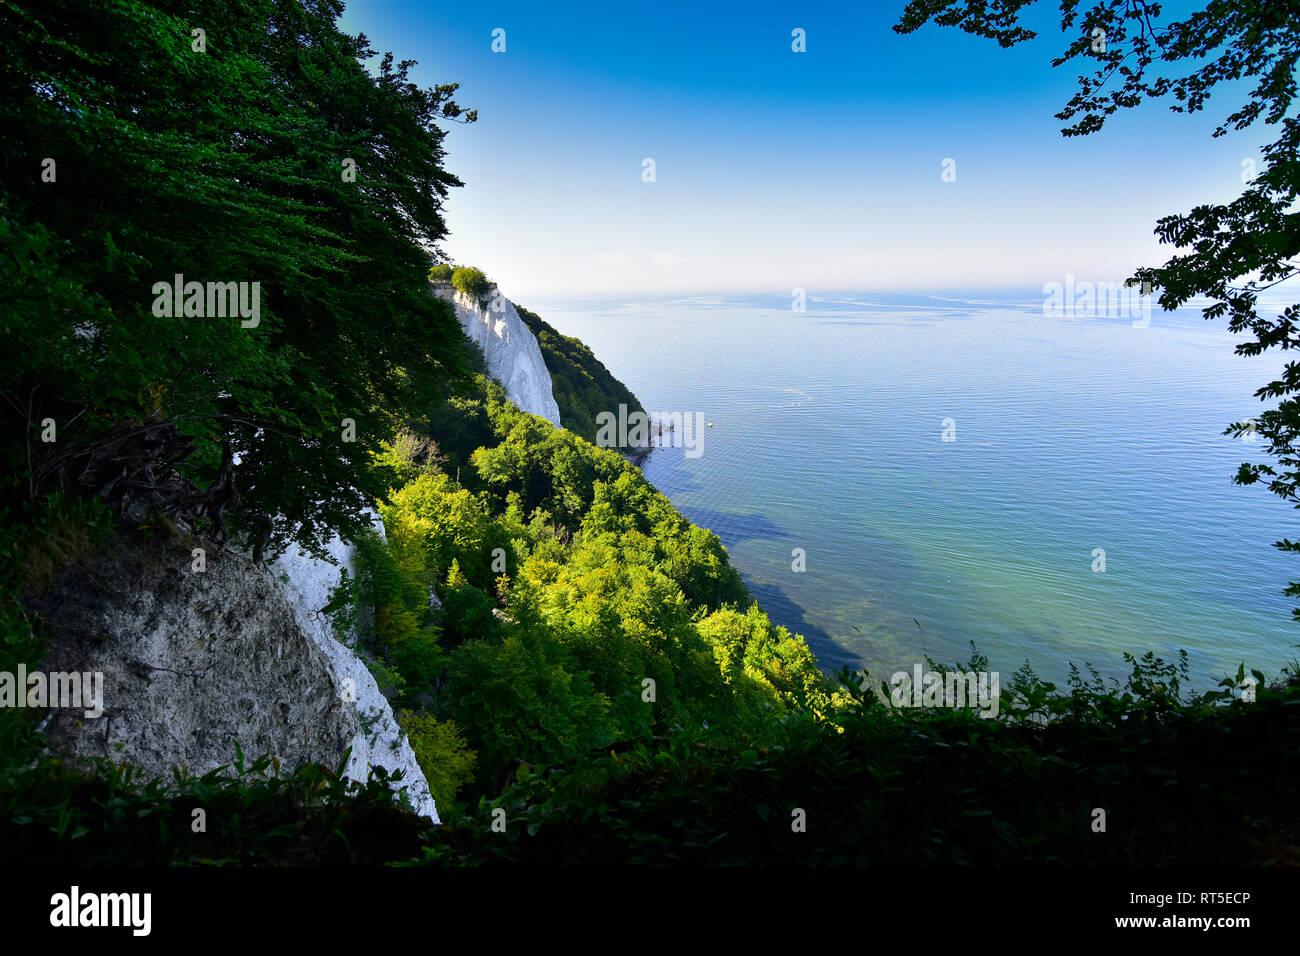 Alemania, Ruegen, Parque Nacional Jasmund, tiza cliff Koenigsstuhl Foto de stock